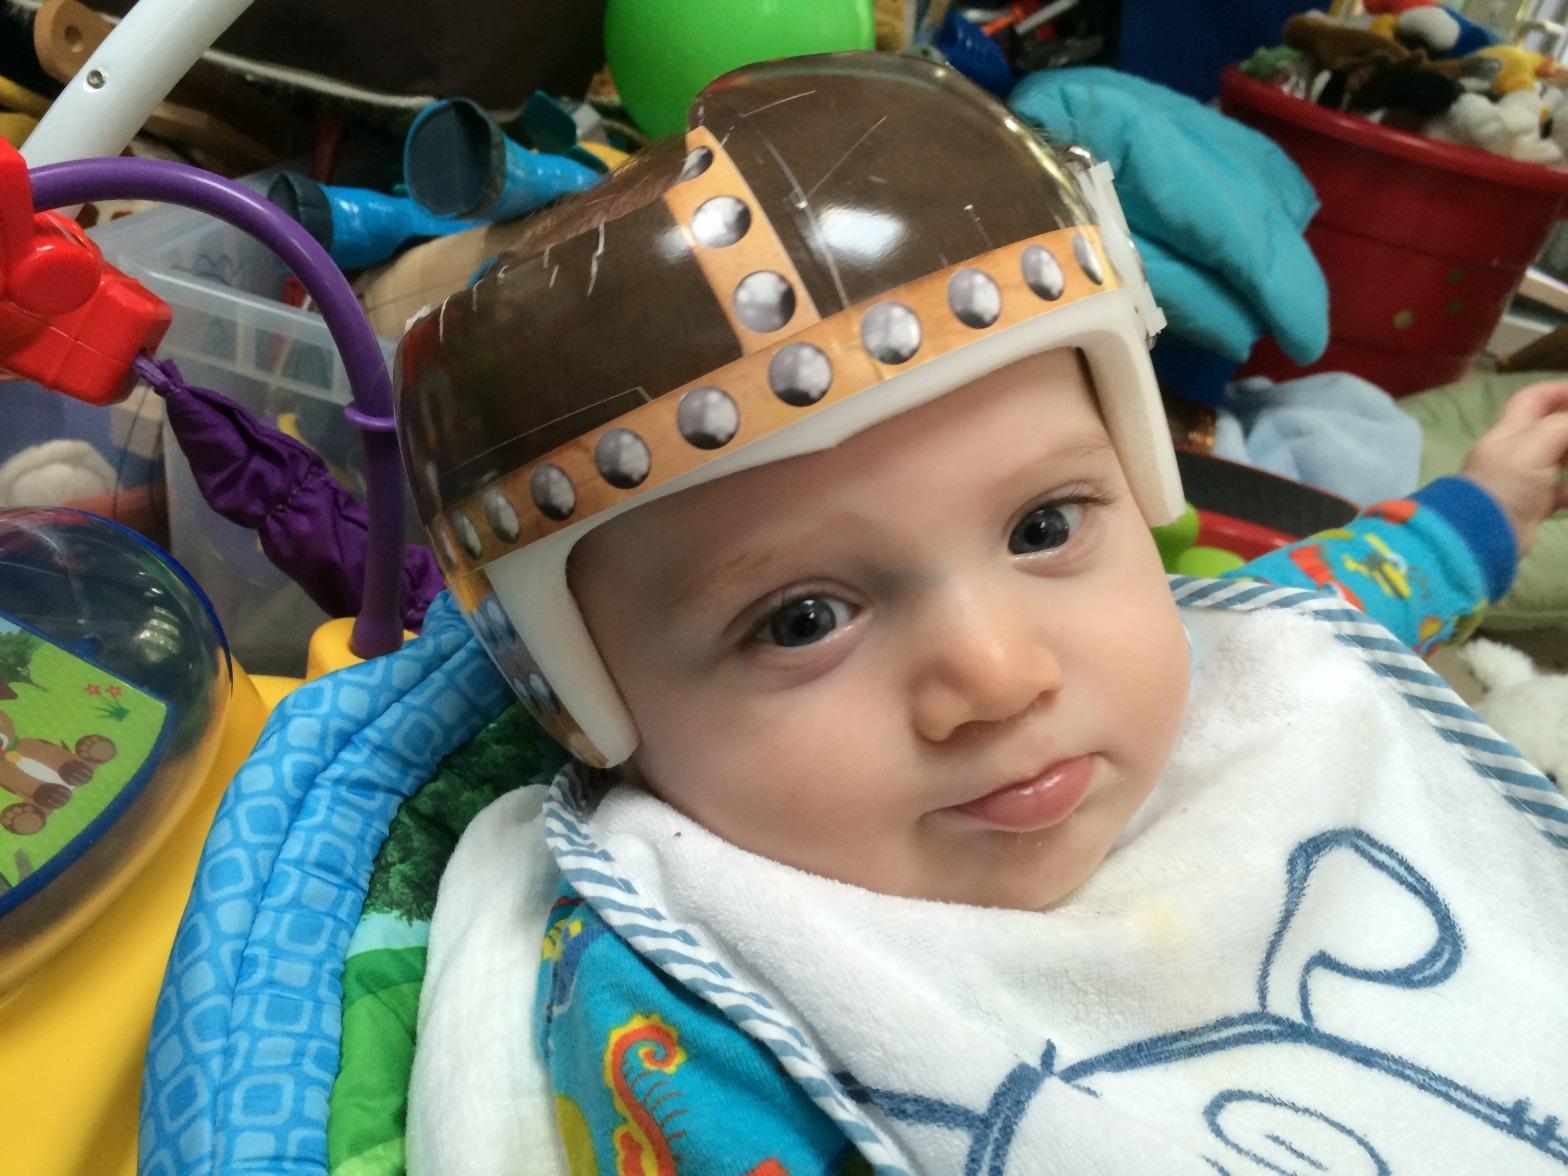 Viking Baby Helmet Design Application Example Bling Your Band - Baby helmet decals